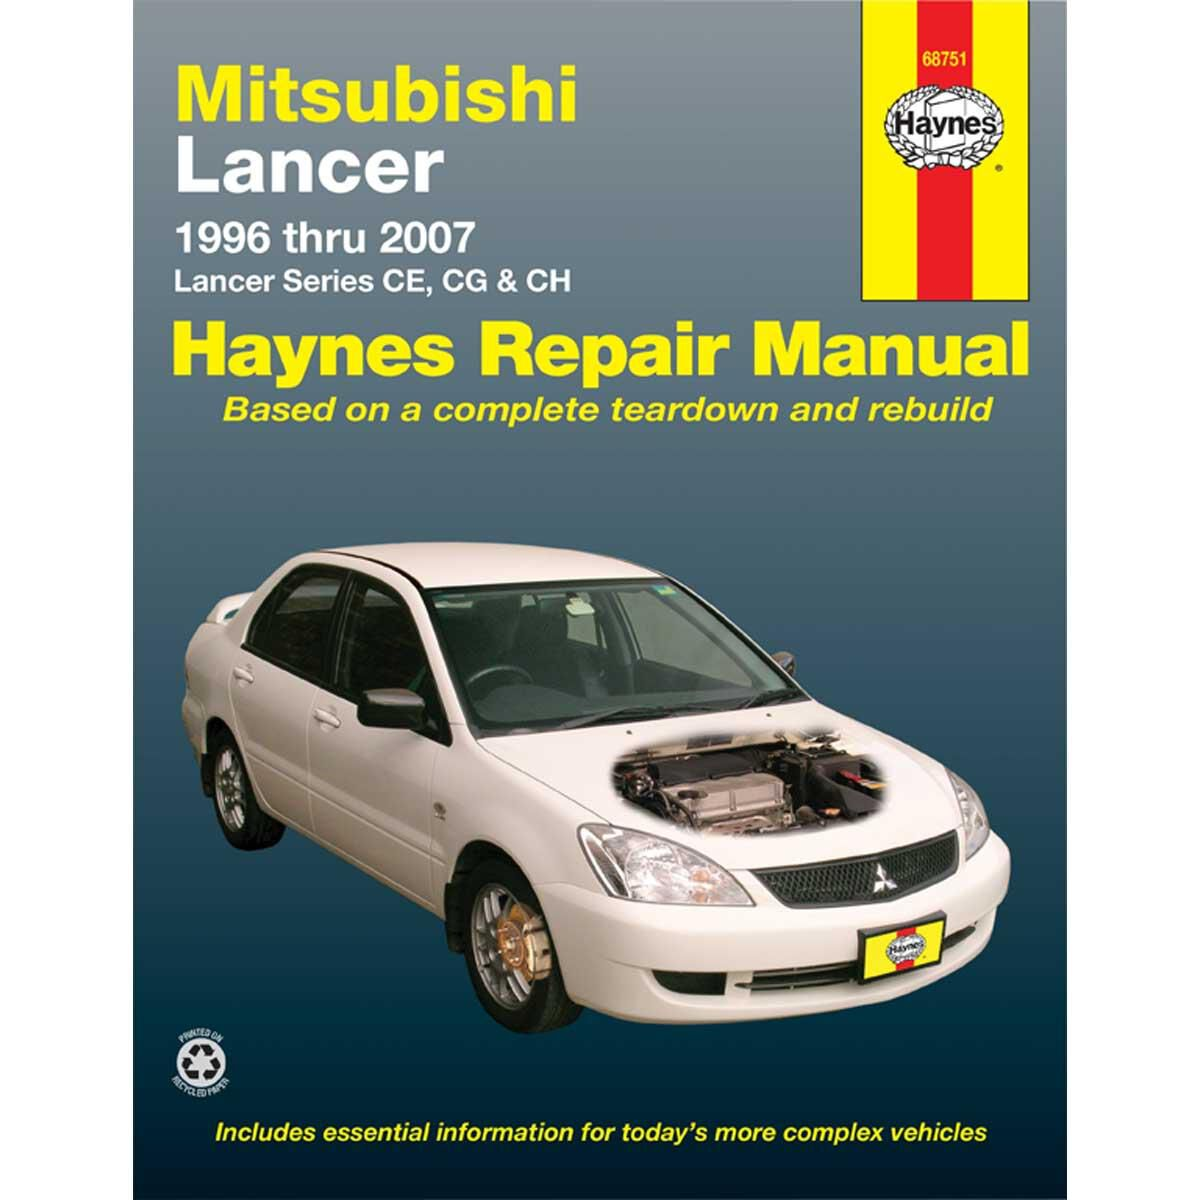 car manuals supercheap auto new zealand rh supercheapauto co nz Honda Fit Interior Honda Fit Interior